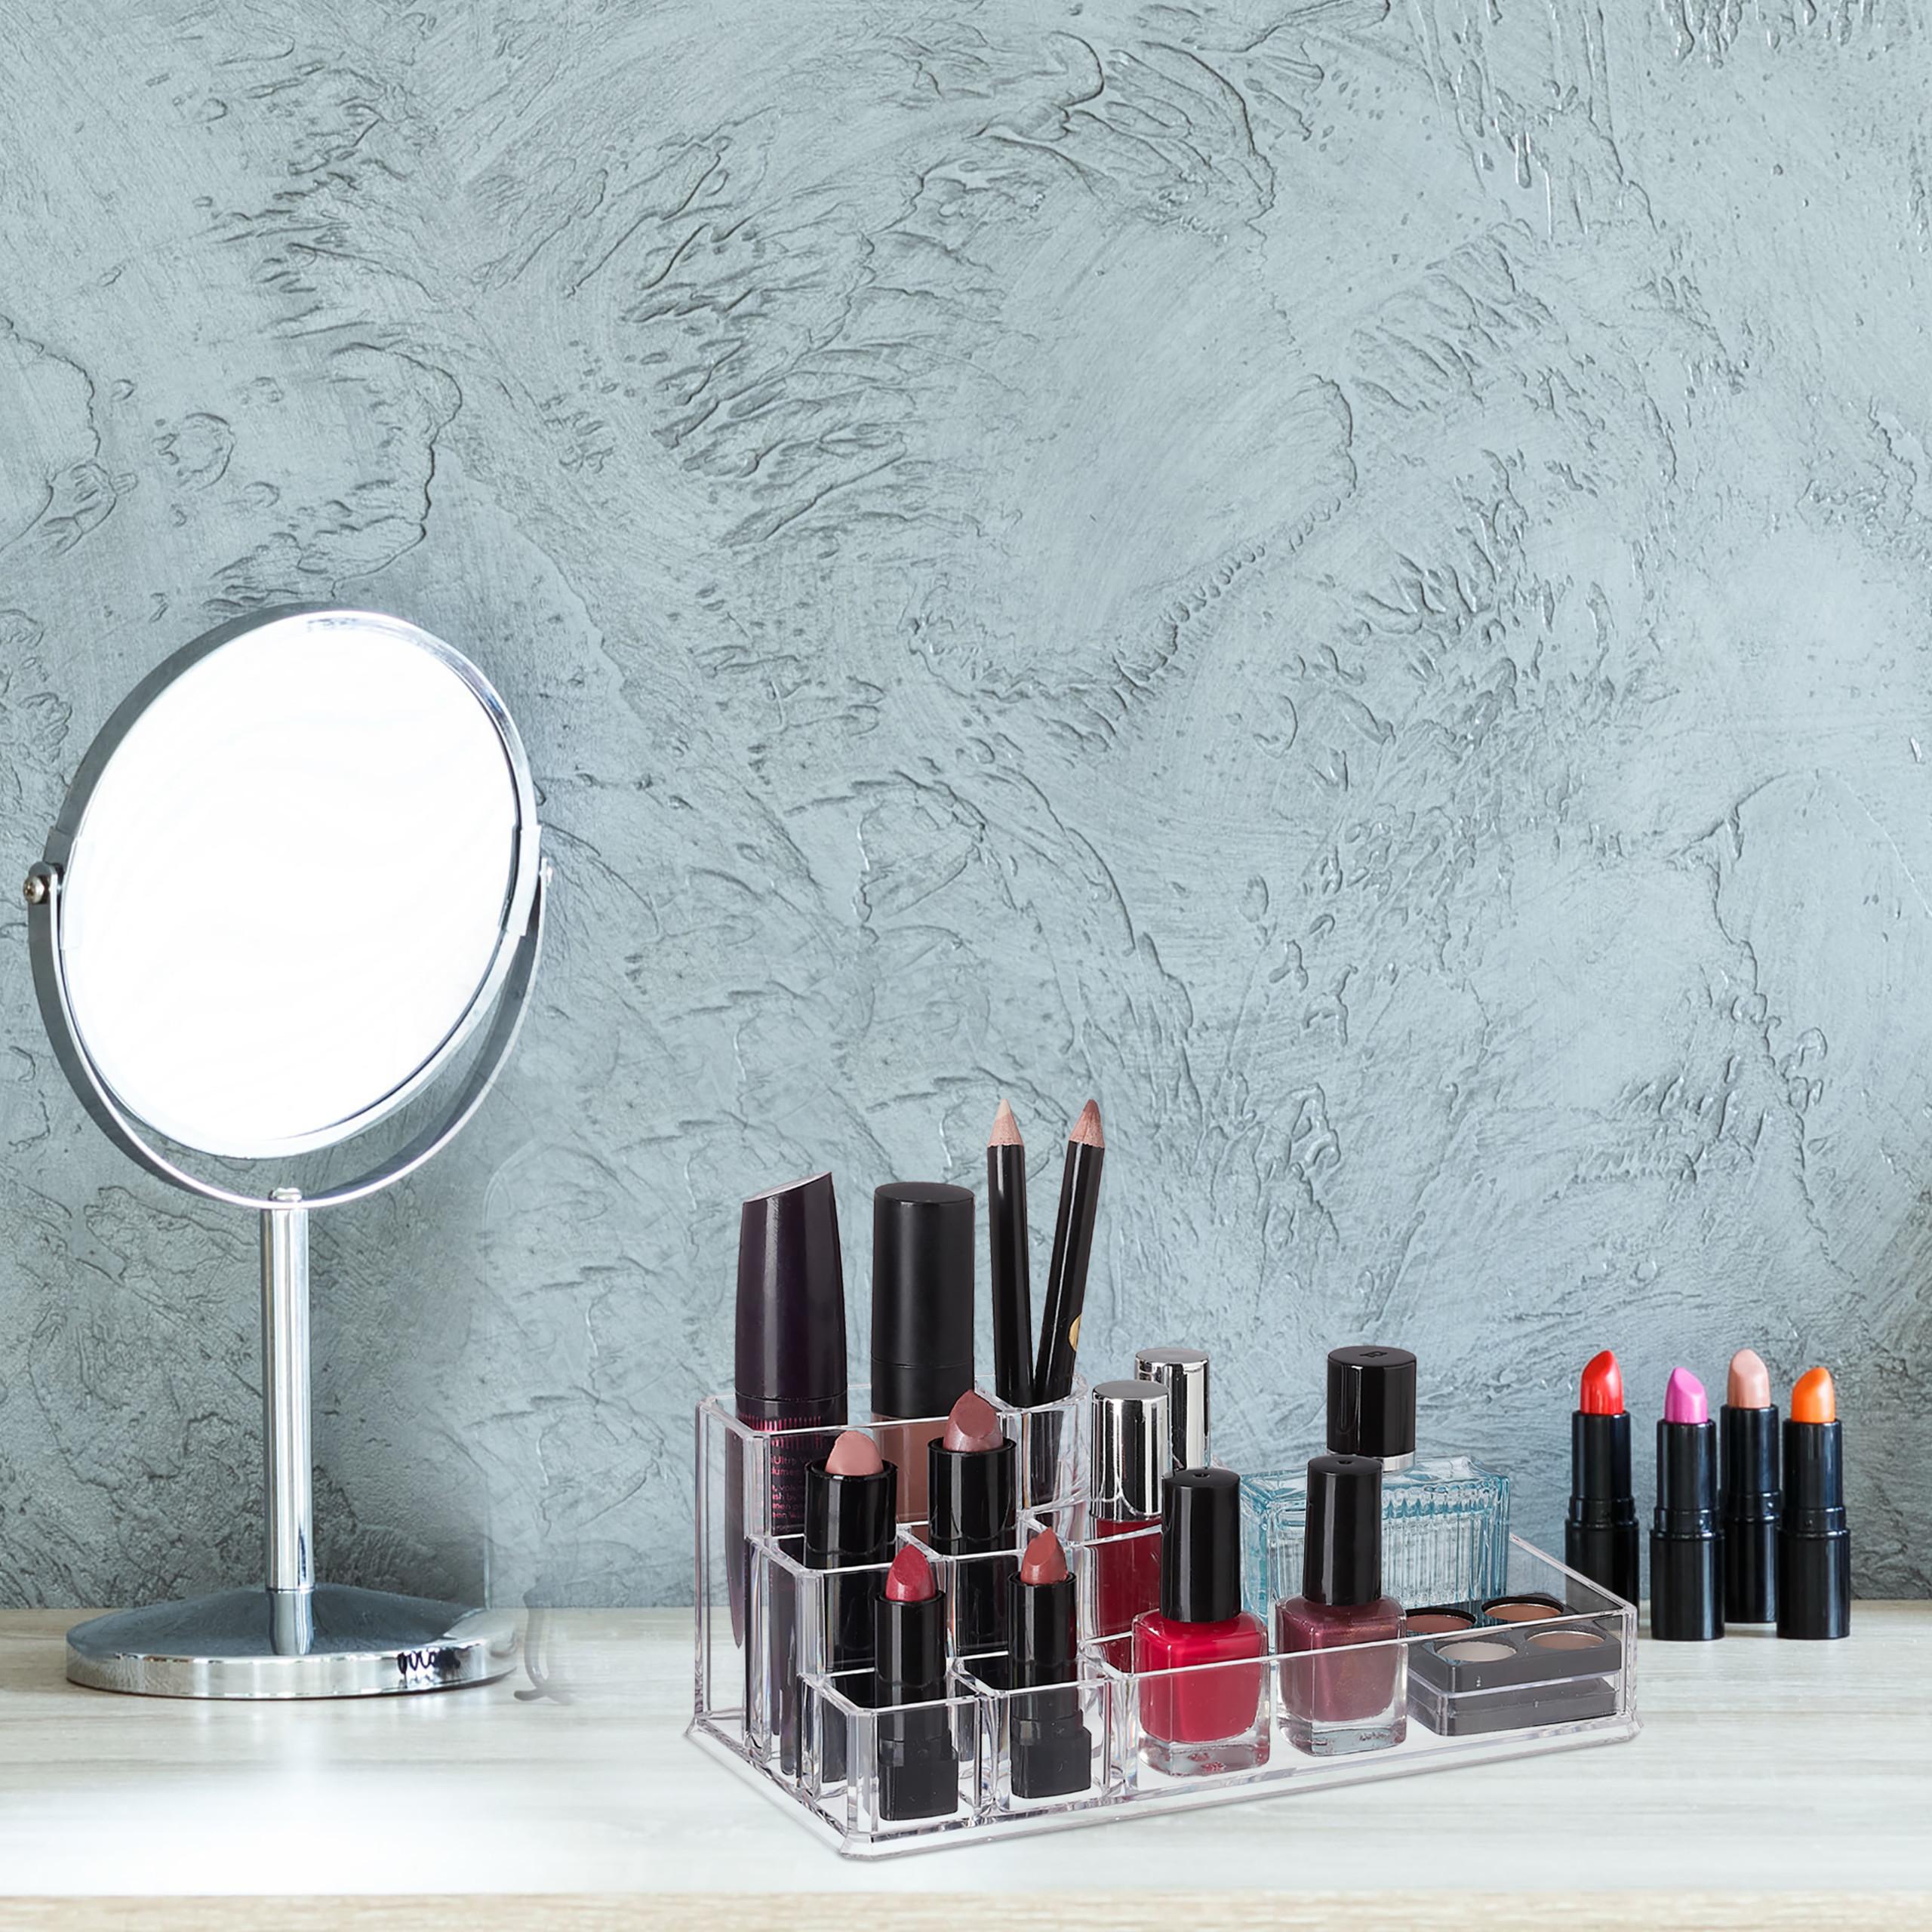 make-up-organizer-acryl-8-vakken-lippenstifthouder-opbergsysteem miniatuur 4